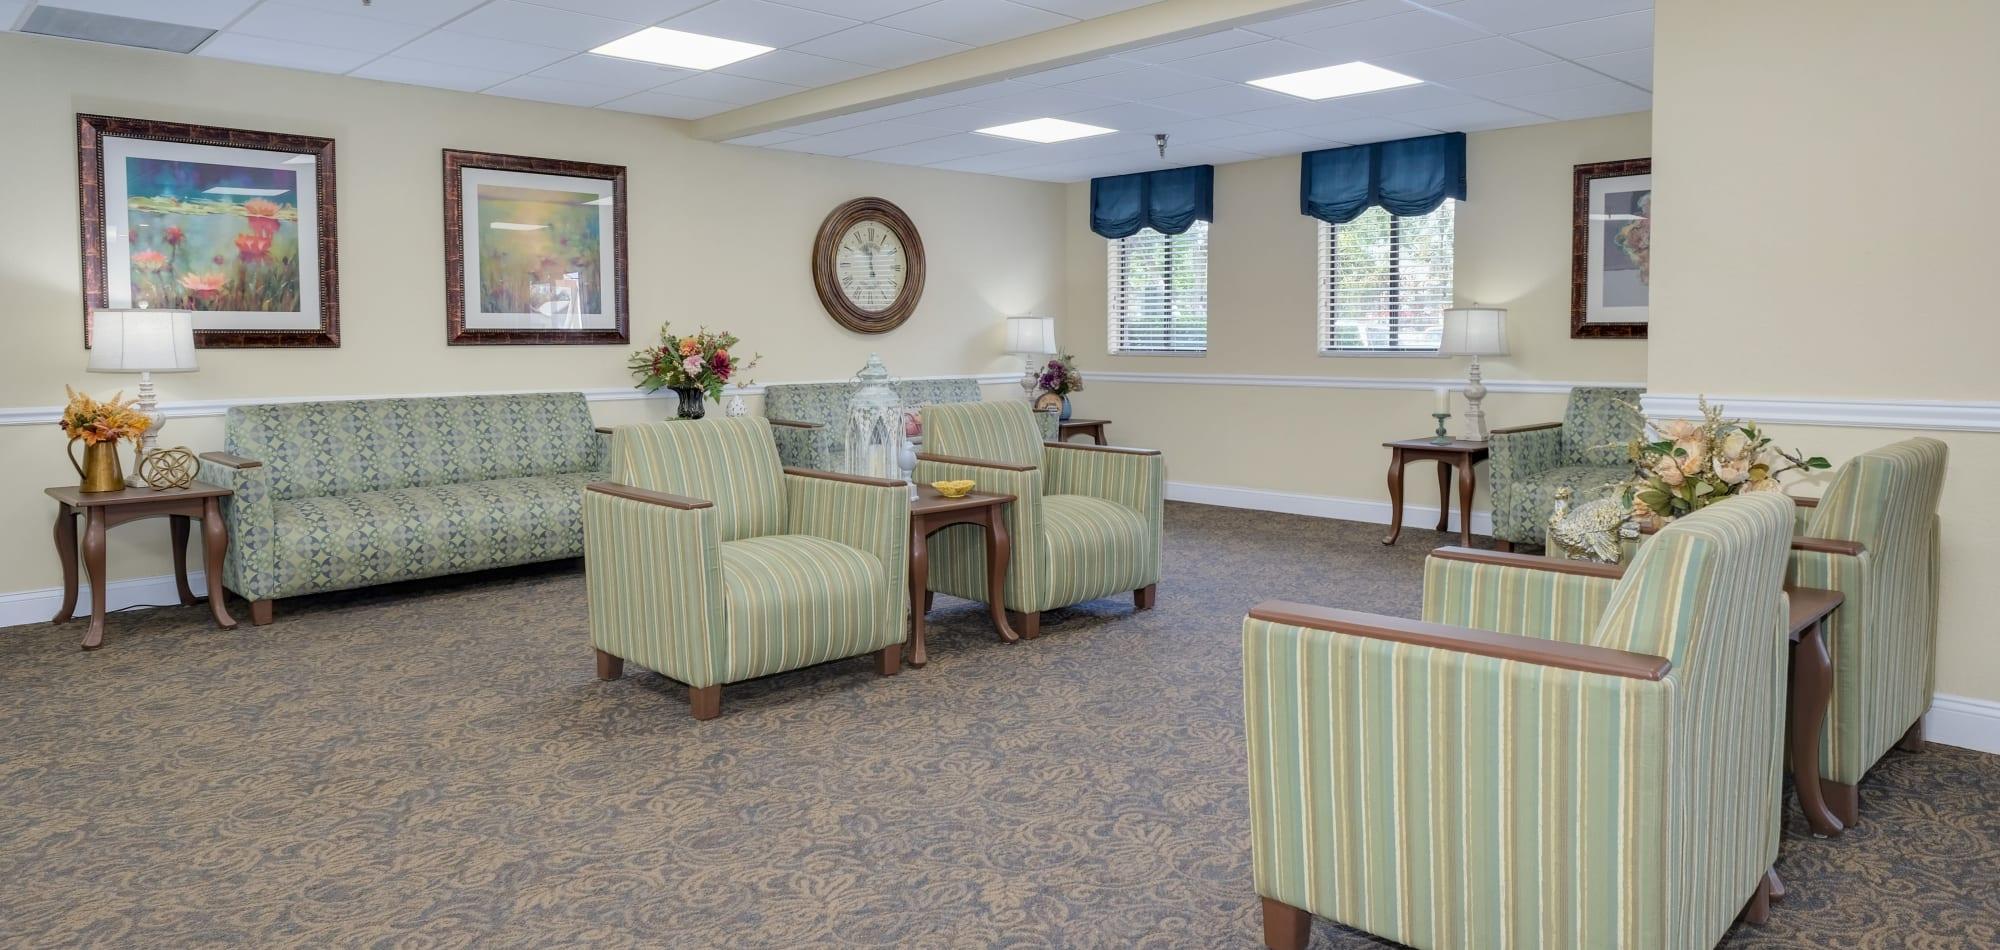 Grand Villa of New Port Richey senior living in Florida